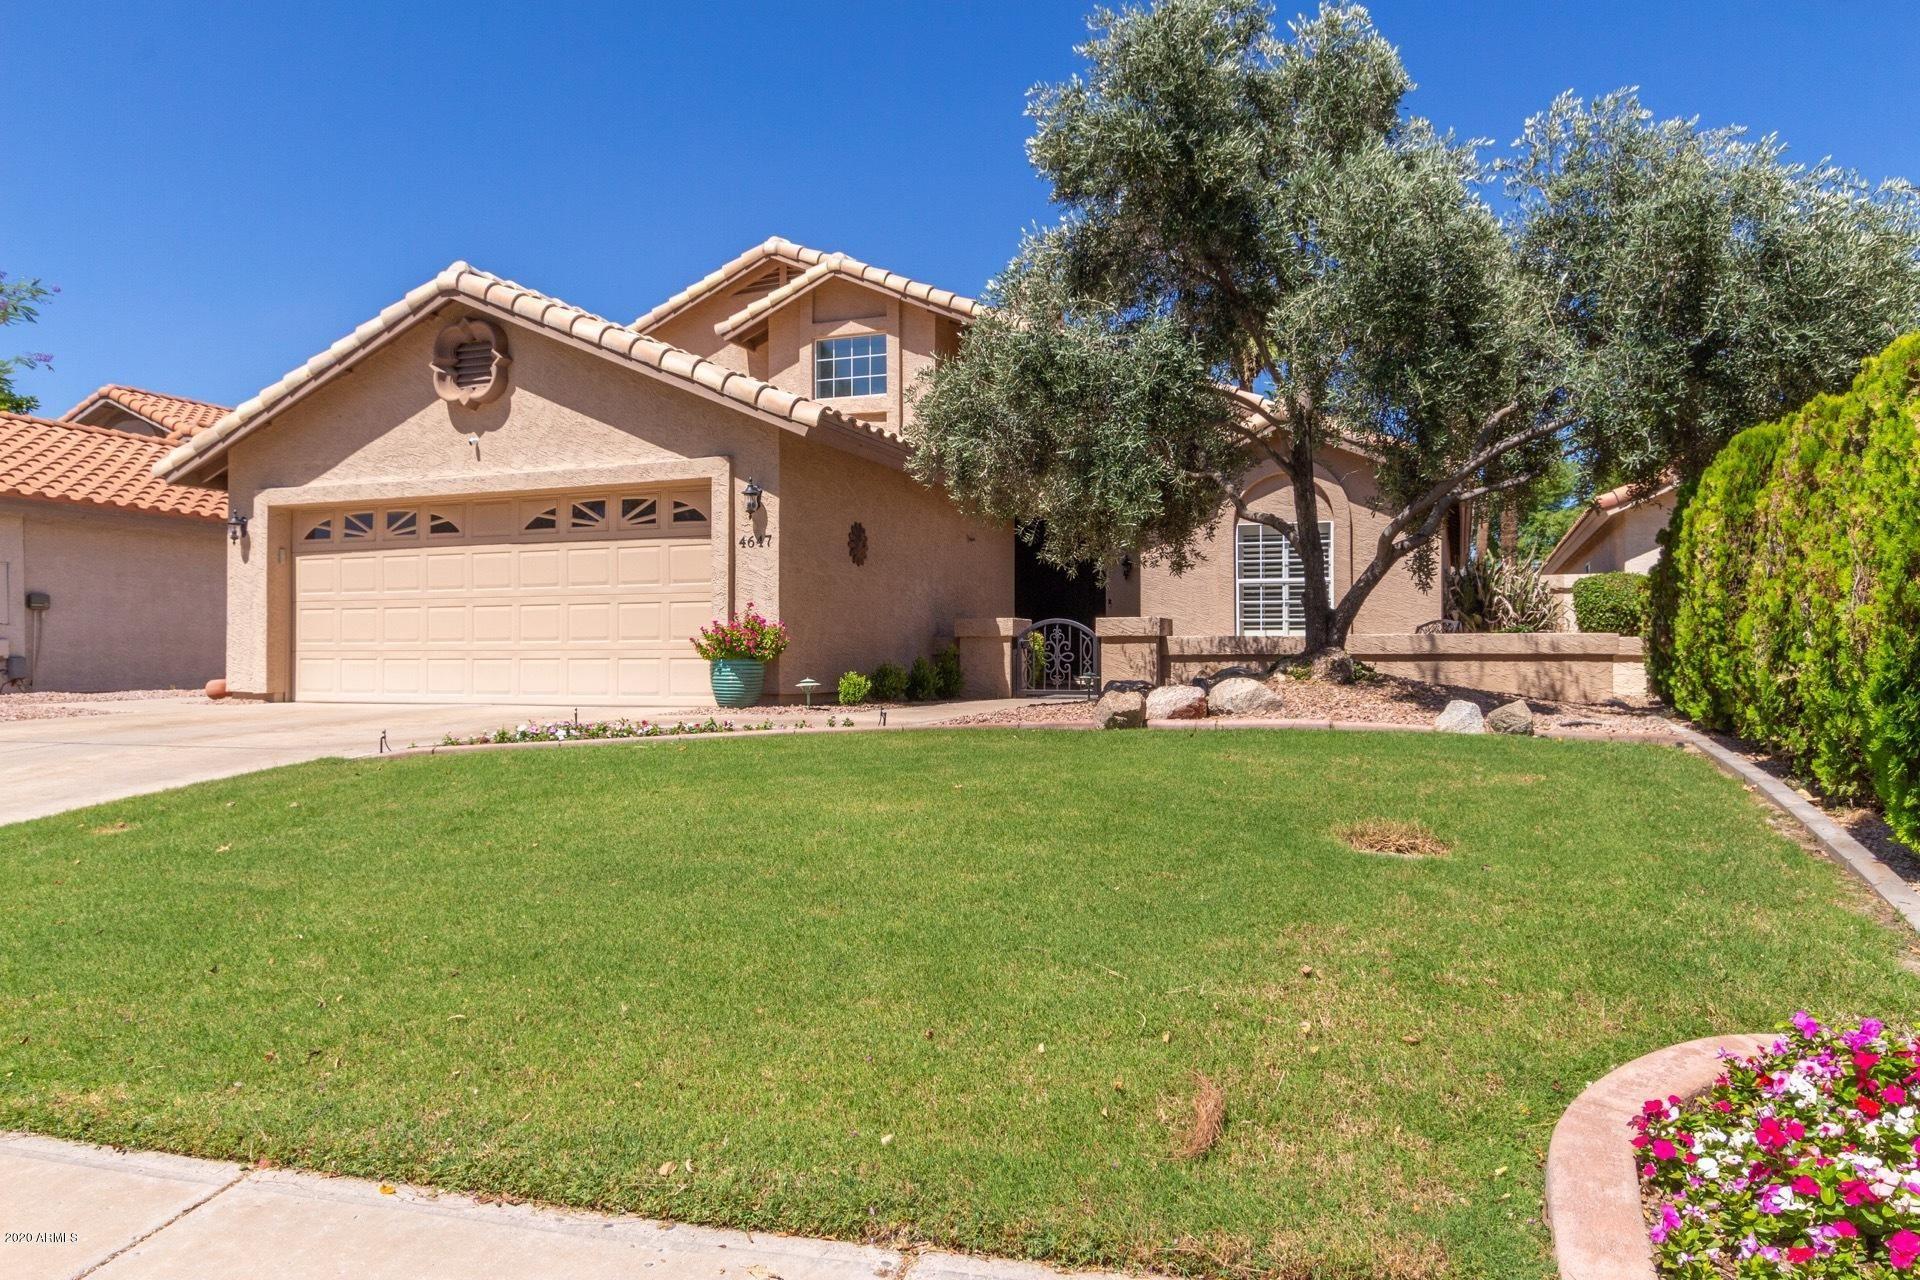 4647 N DESERT STREAM Way, Litchfield Park, AZ 85340 - MLS#: 6080808